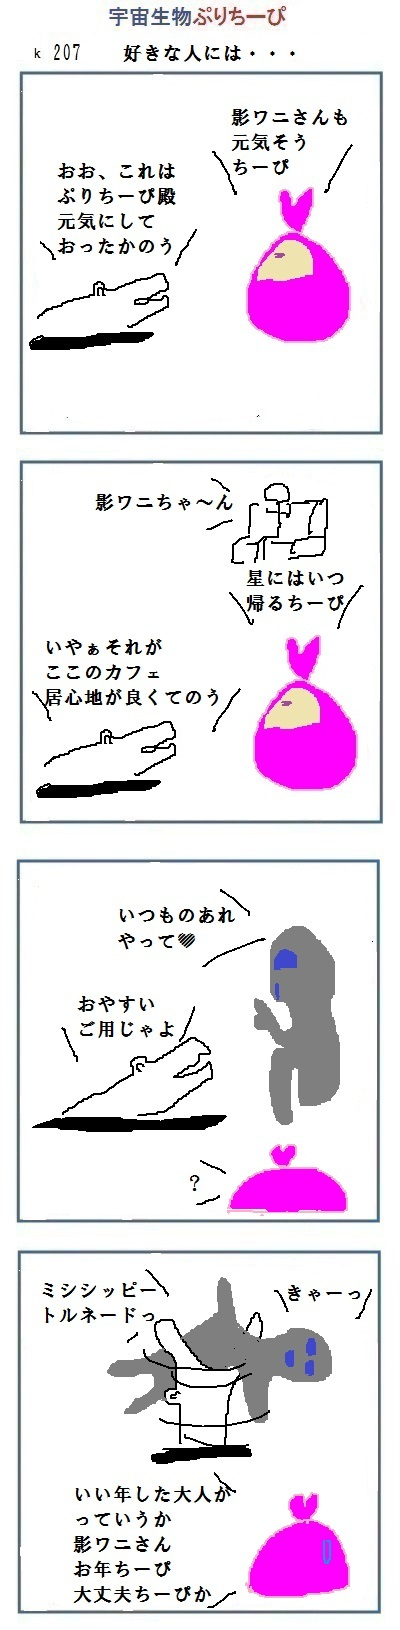 161229_k207